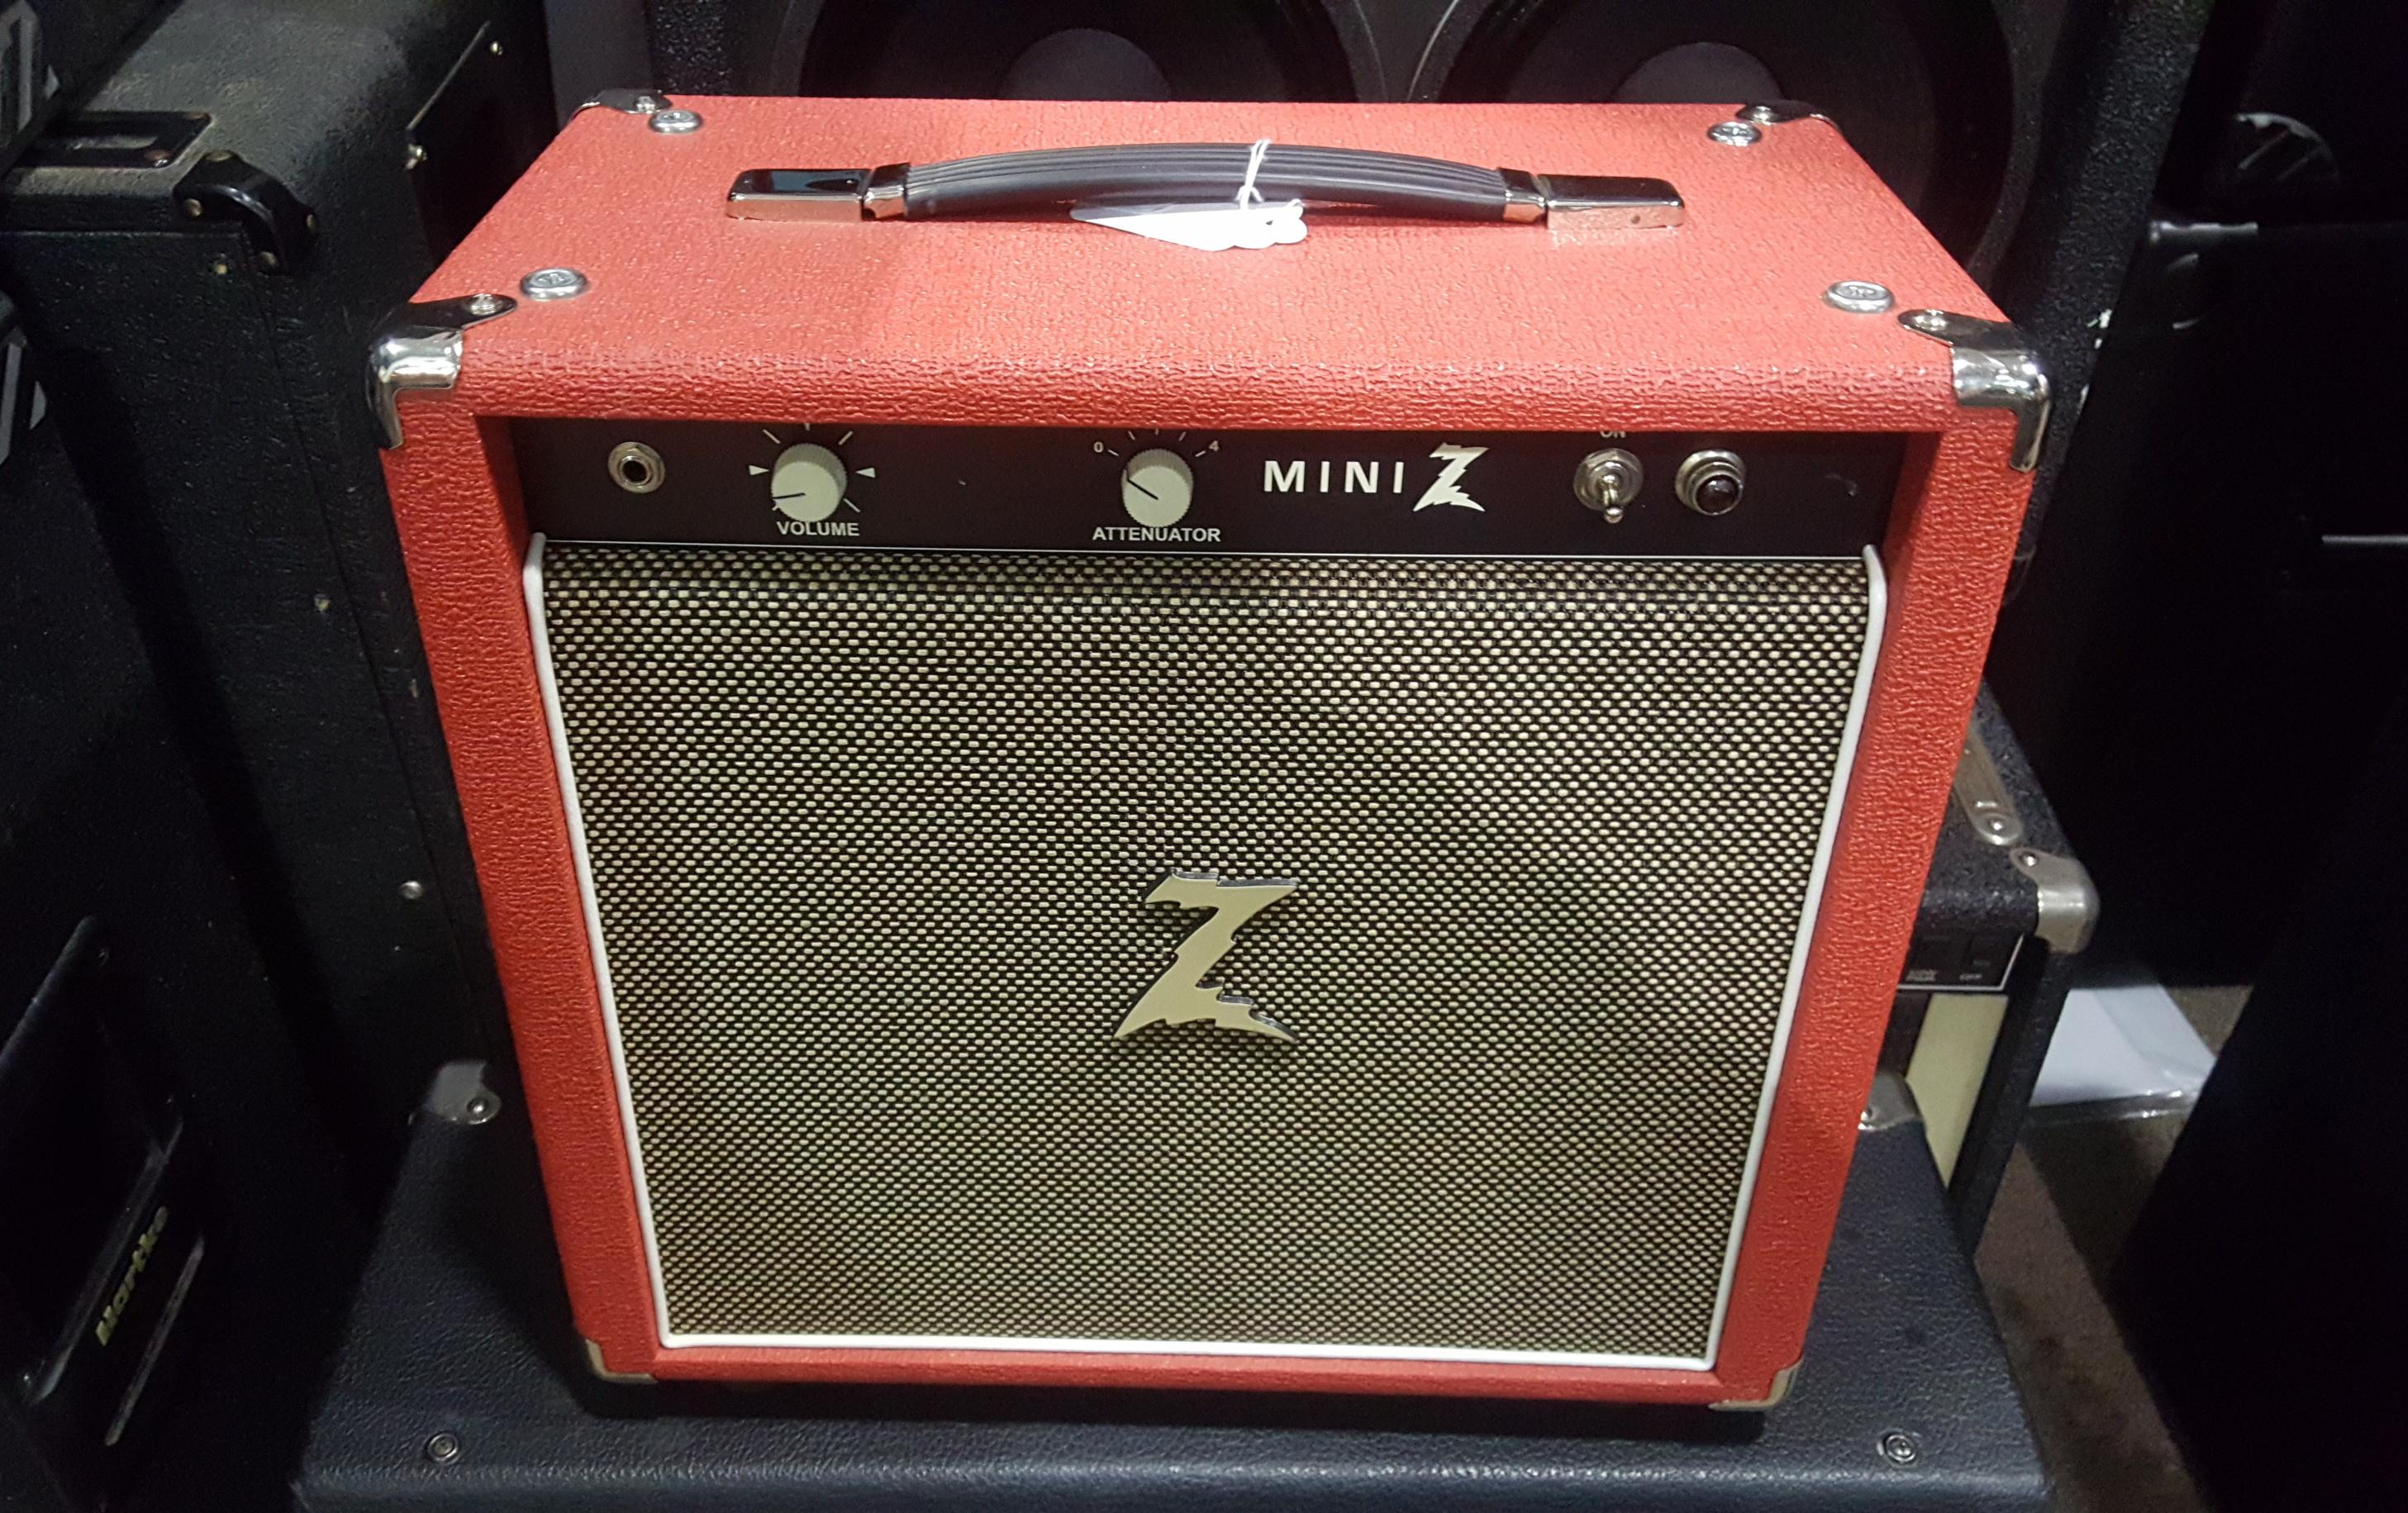 DR. Z MINI Z 5-Watt 1x10 Tube Guitar Amp Combo - LOCAL PICKUP ONLY!